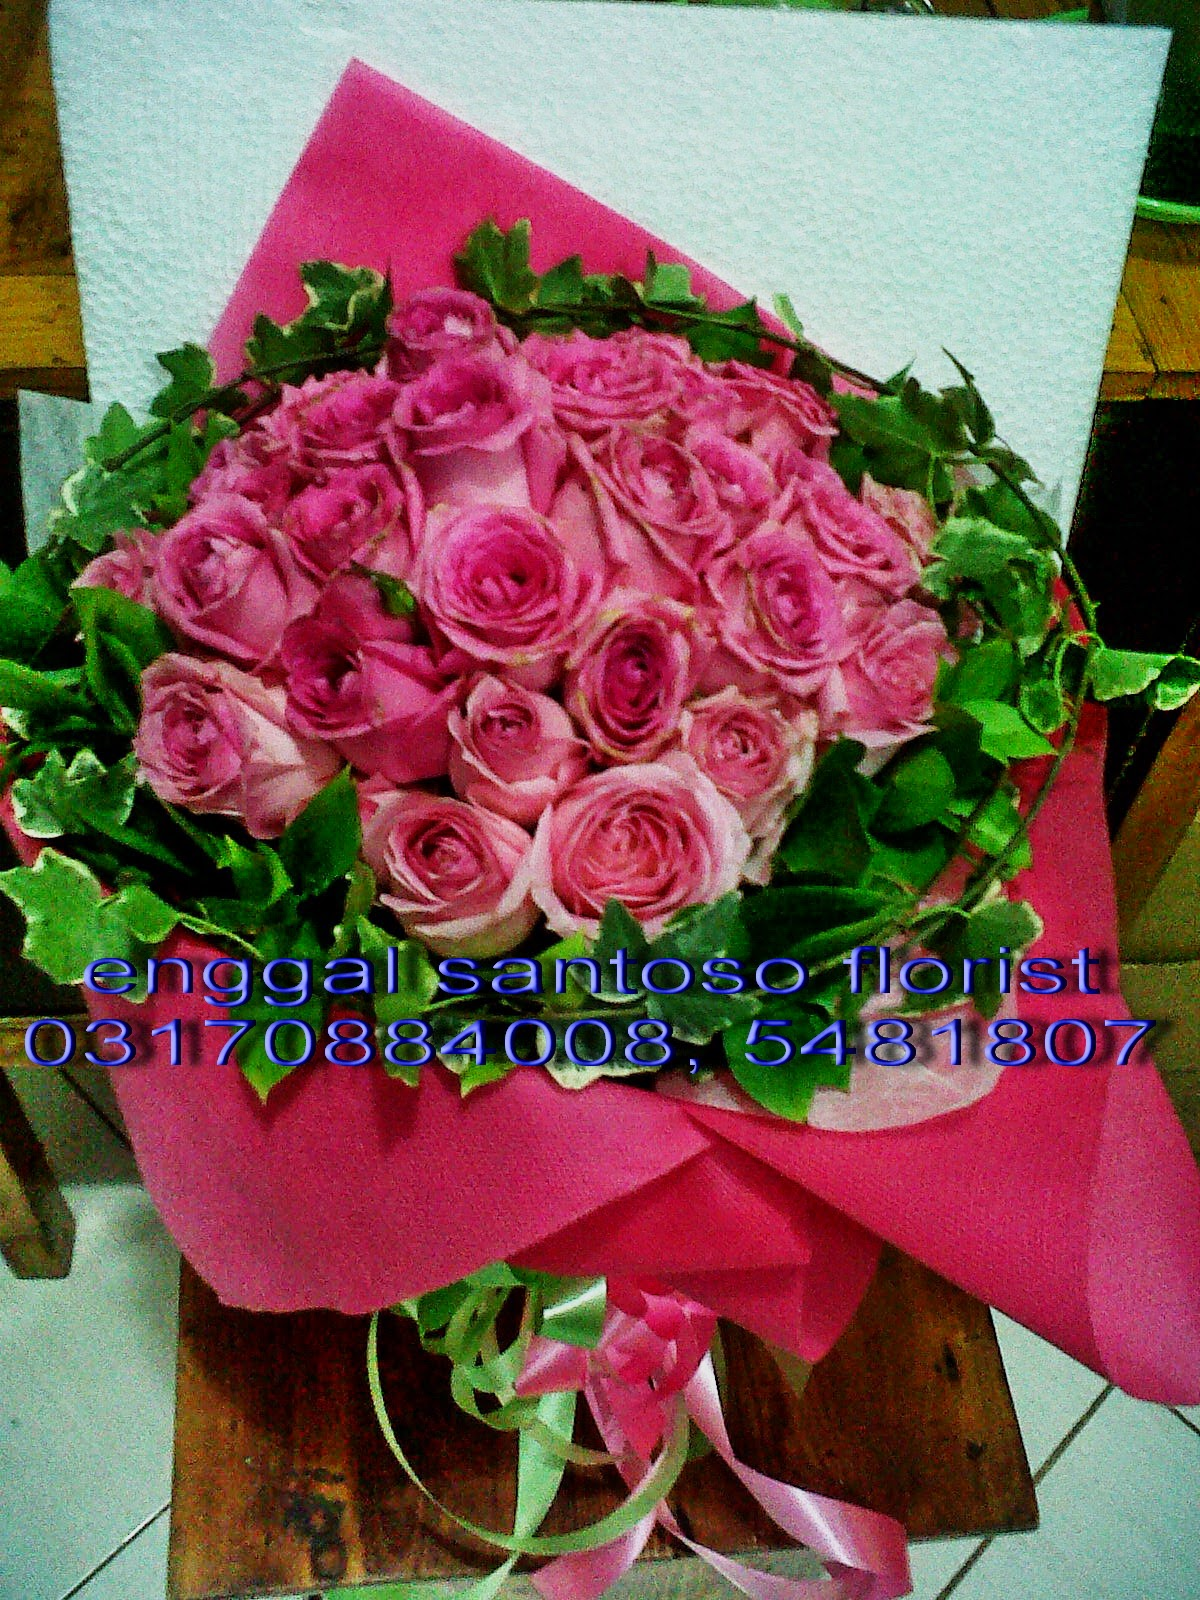 rangkaian karangan bunga tangan & hand bouquet